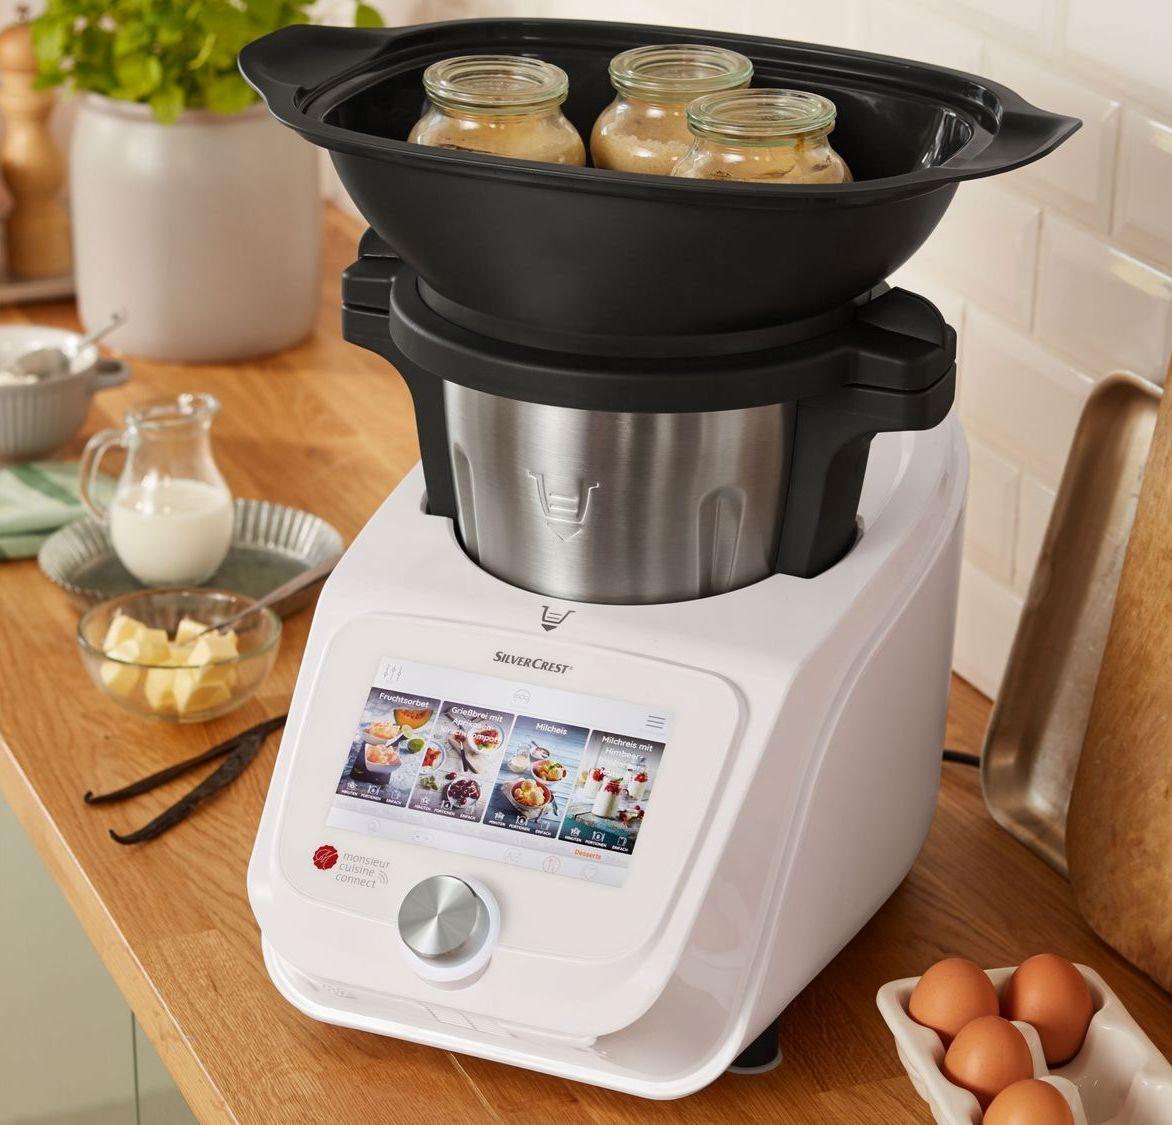 Silvercrest® Küchenmaschine Monsieur Cuisine Connect Skmc 1200